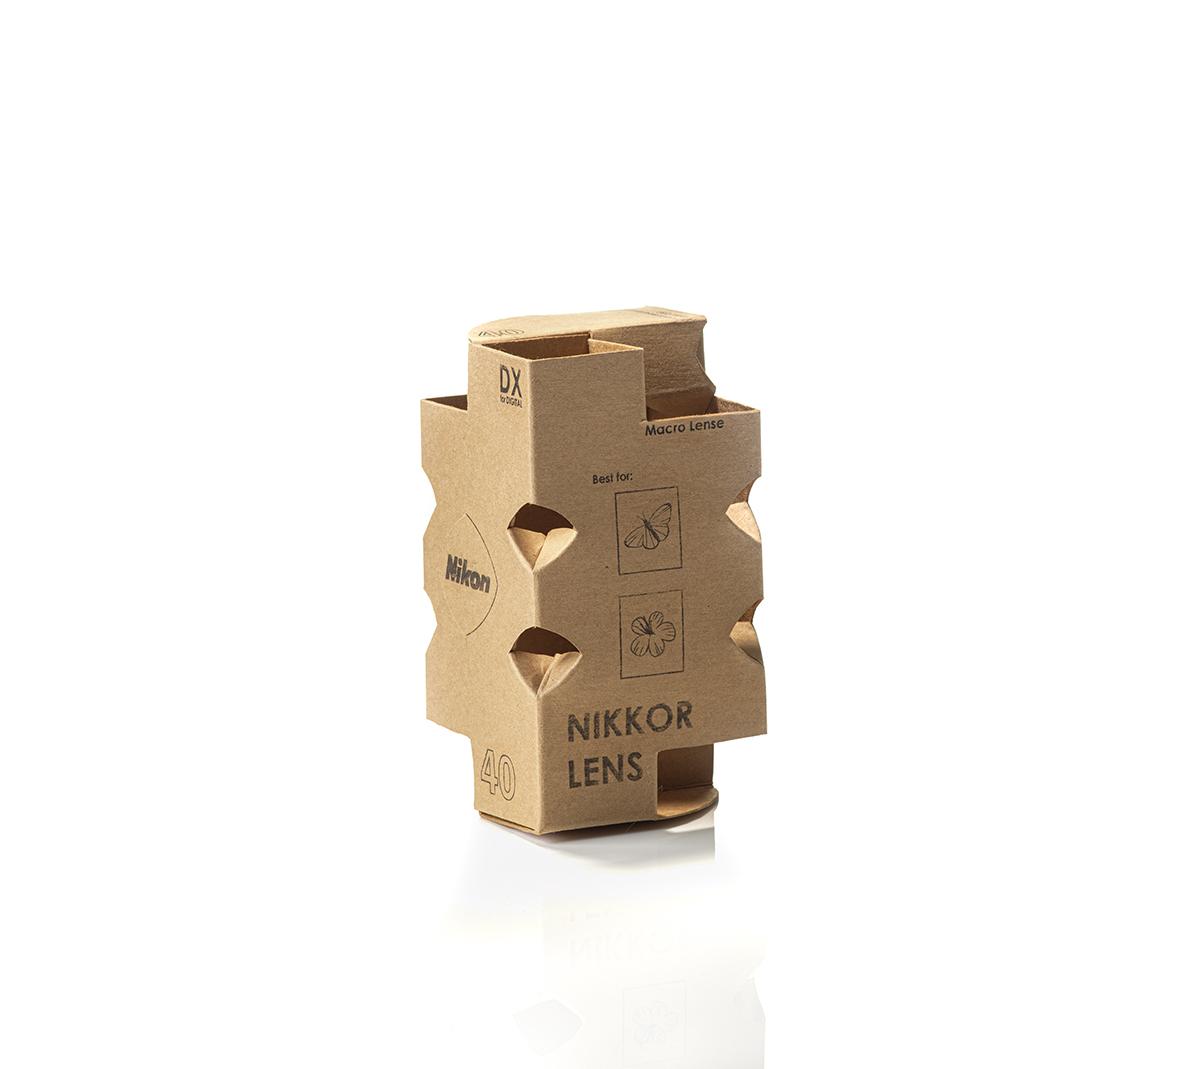 carton-award-image 233193